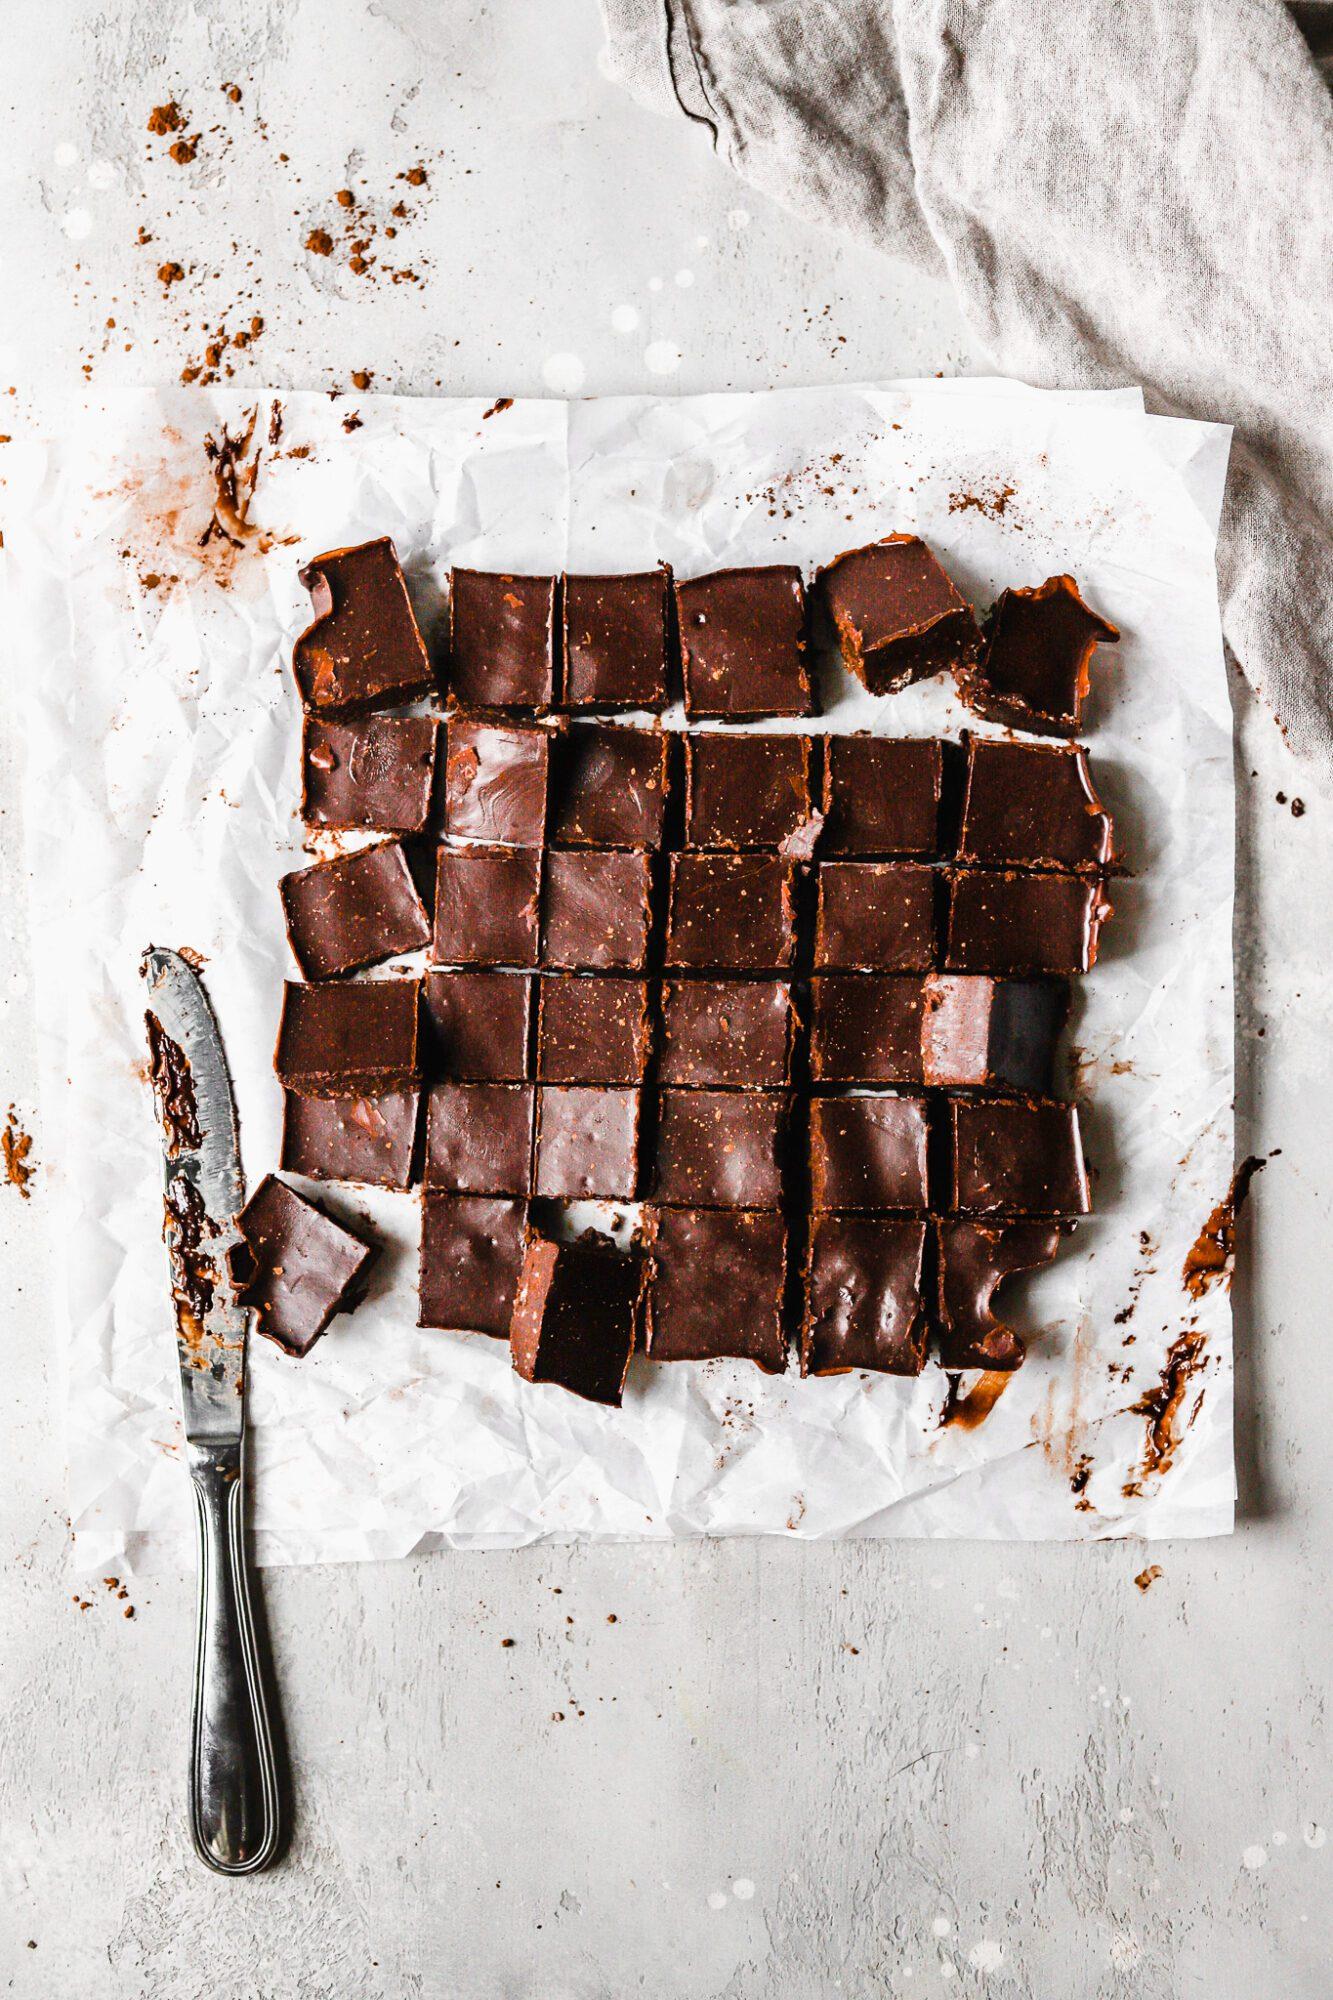 sliced chocolate vegan fudge